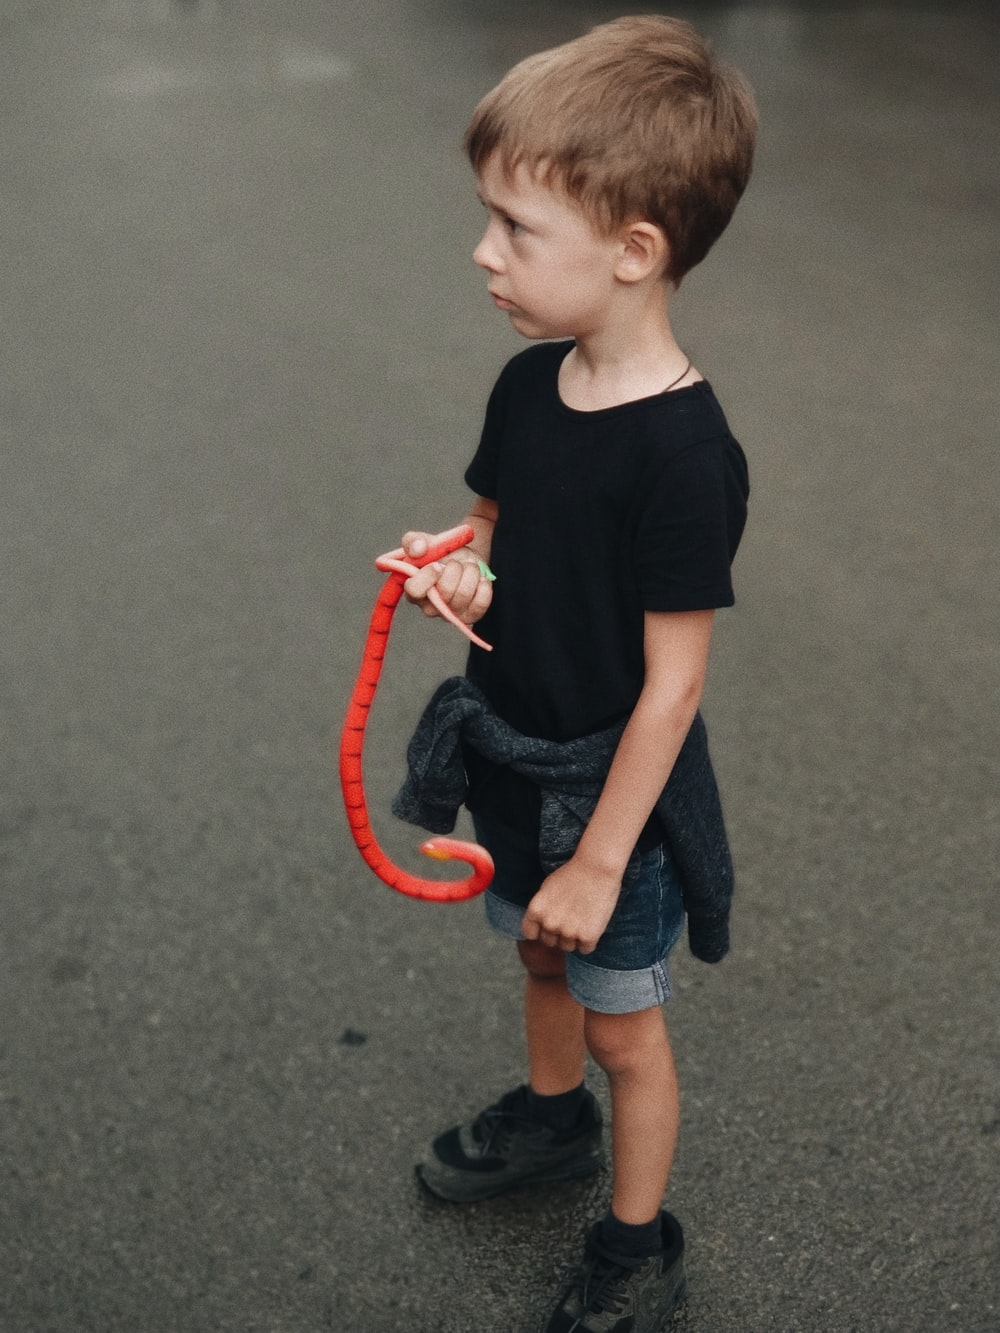 500 sad boy pictures hd download free images on unsplash